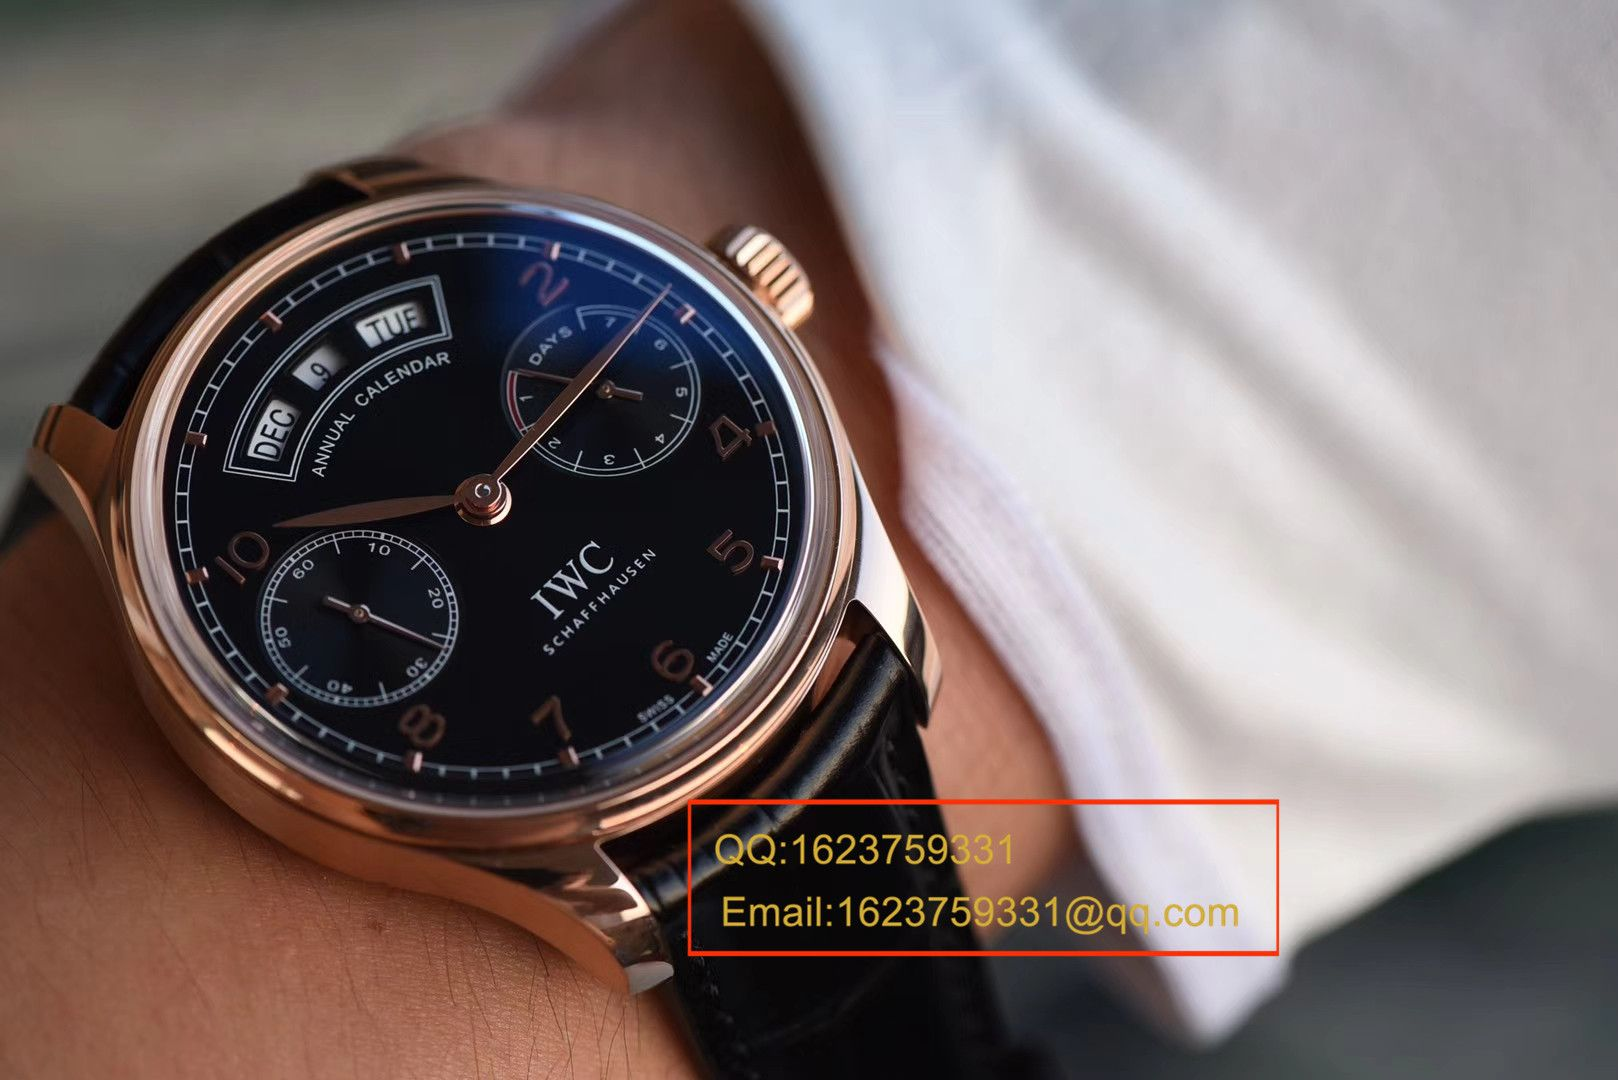 【YL一比一超A高仿手表】万国葡萄牙年历腕表万国年历玫瑰金黑面款 / WG125